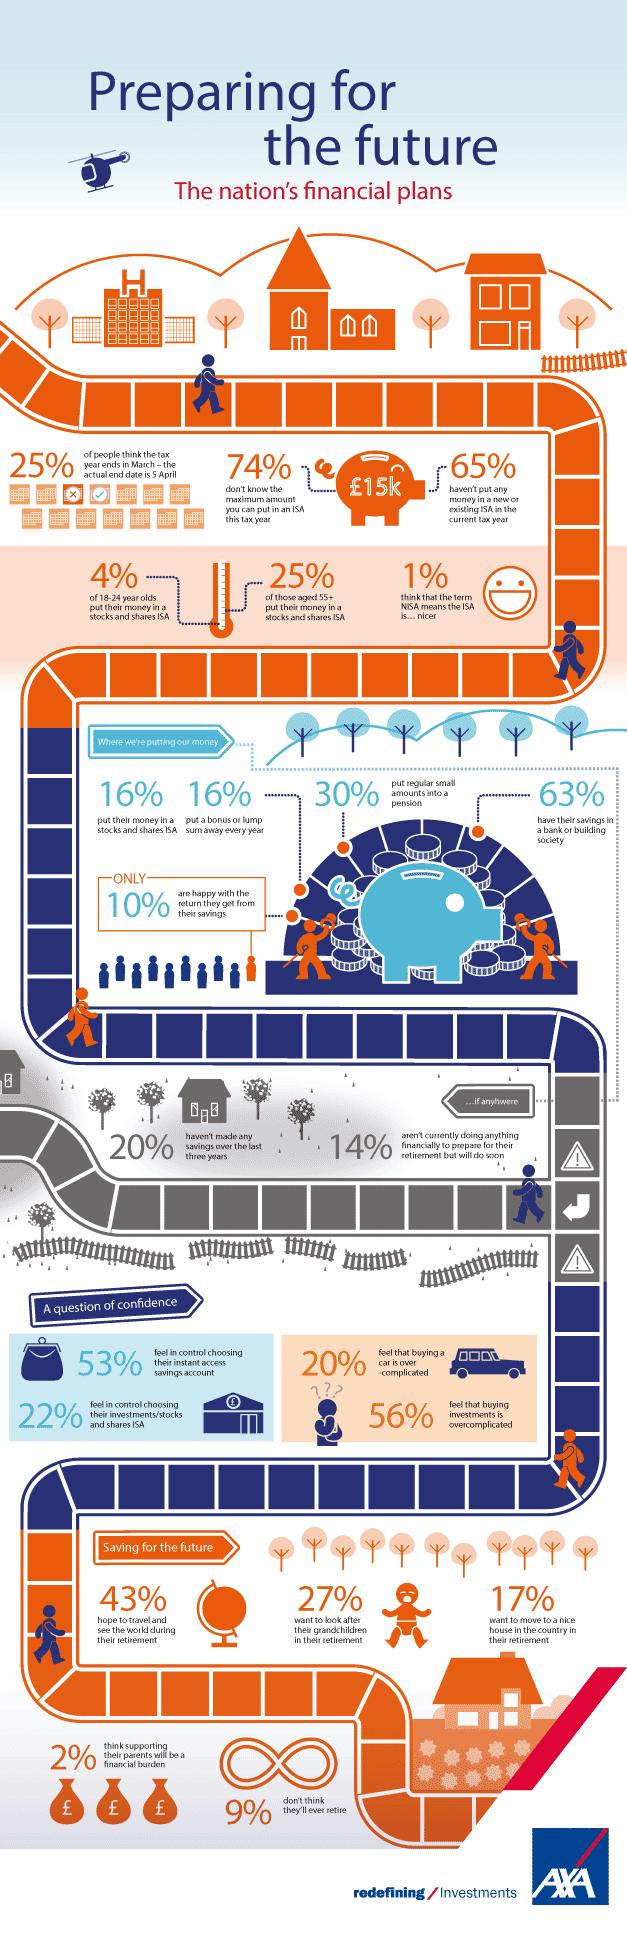 axa-self-investor-preparing-for-future-infographic-blog